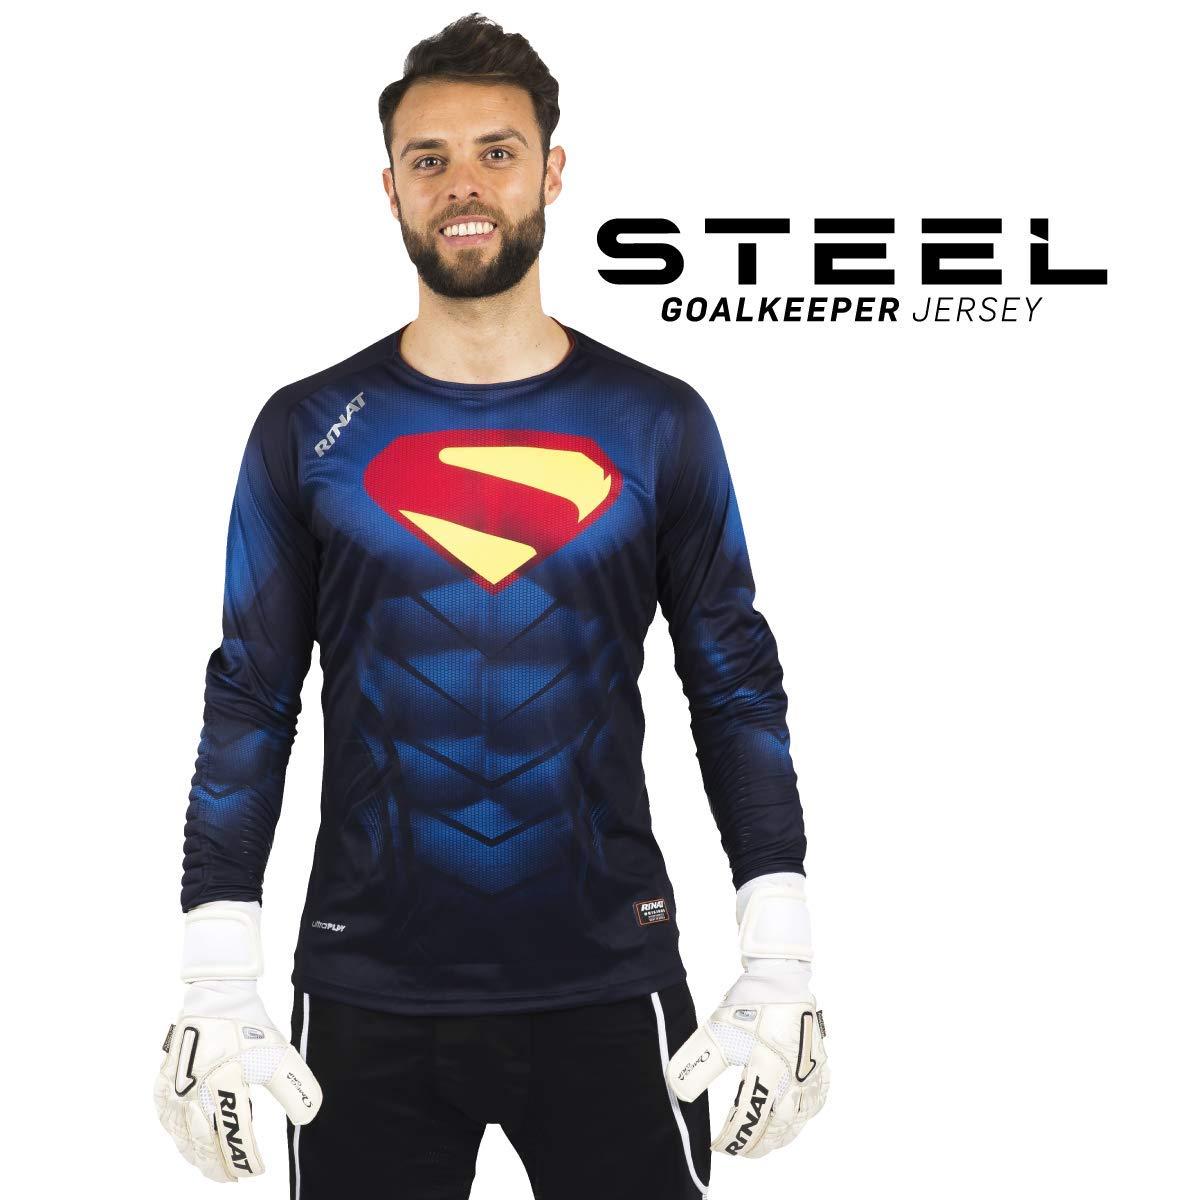 91db43df5c2 Amazon.com : Rinat New Steel Jersey : Sports & Outdoors